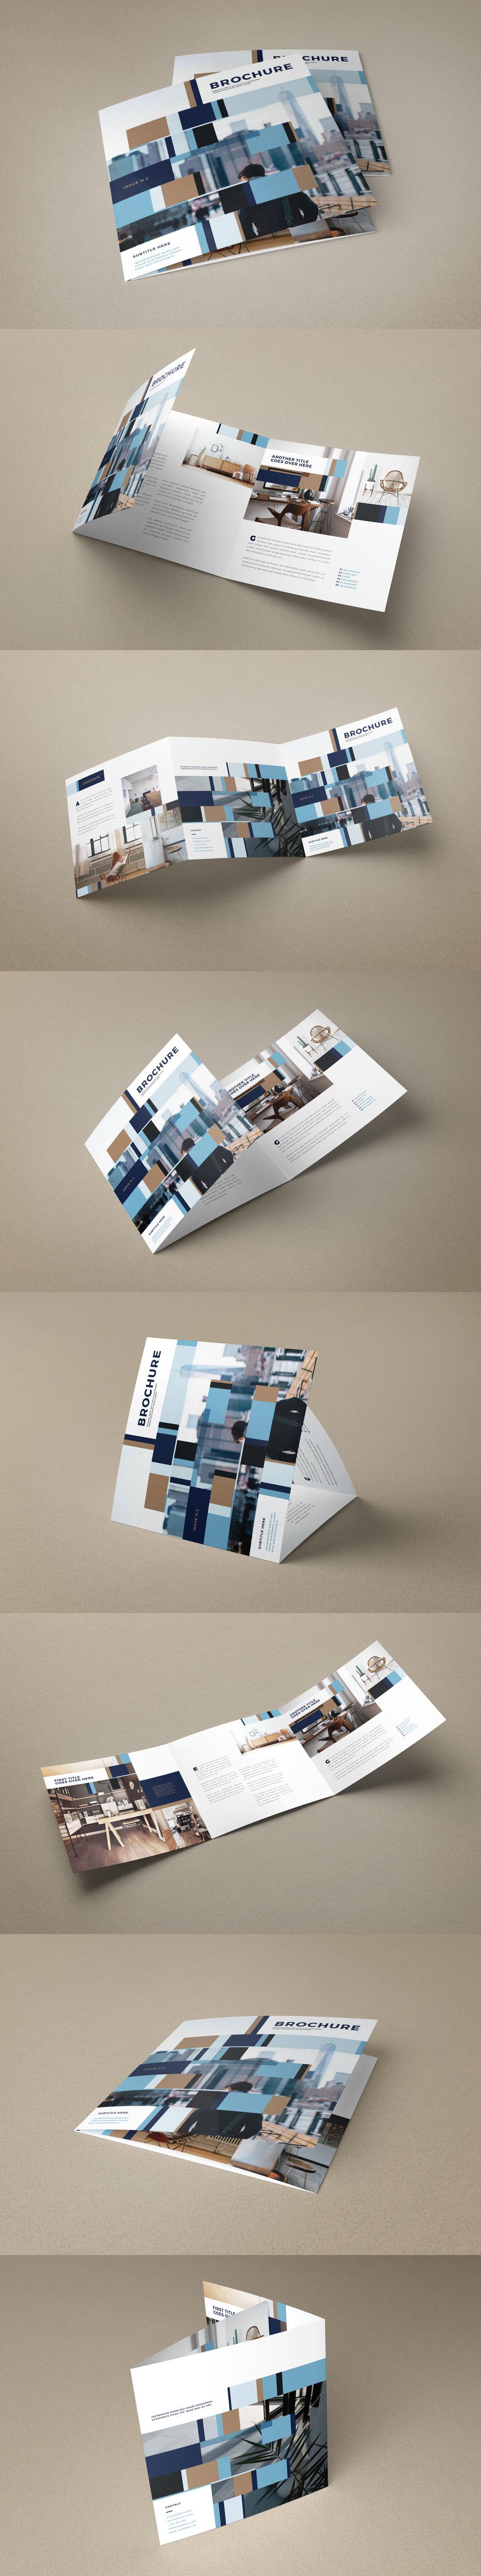 Square Modern Interior Design Trifold Brochure Template INDD